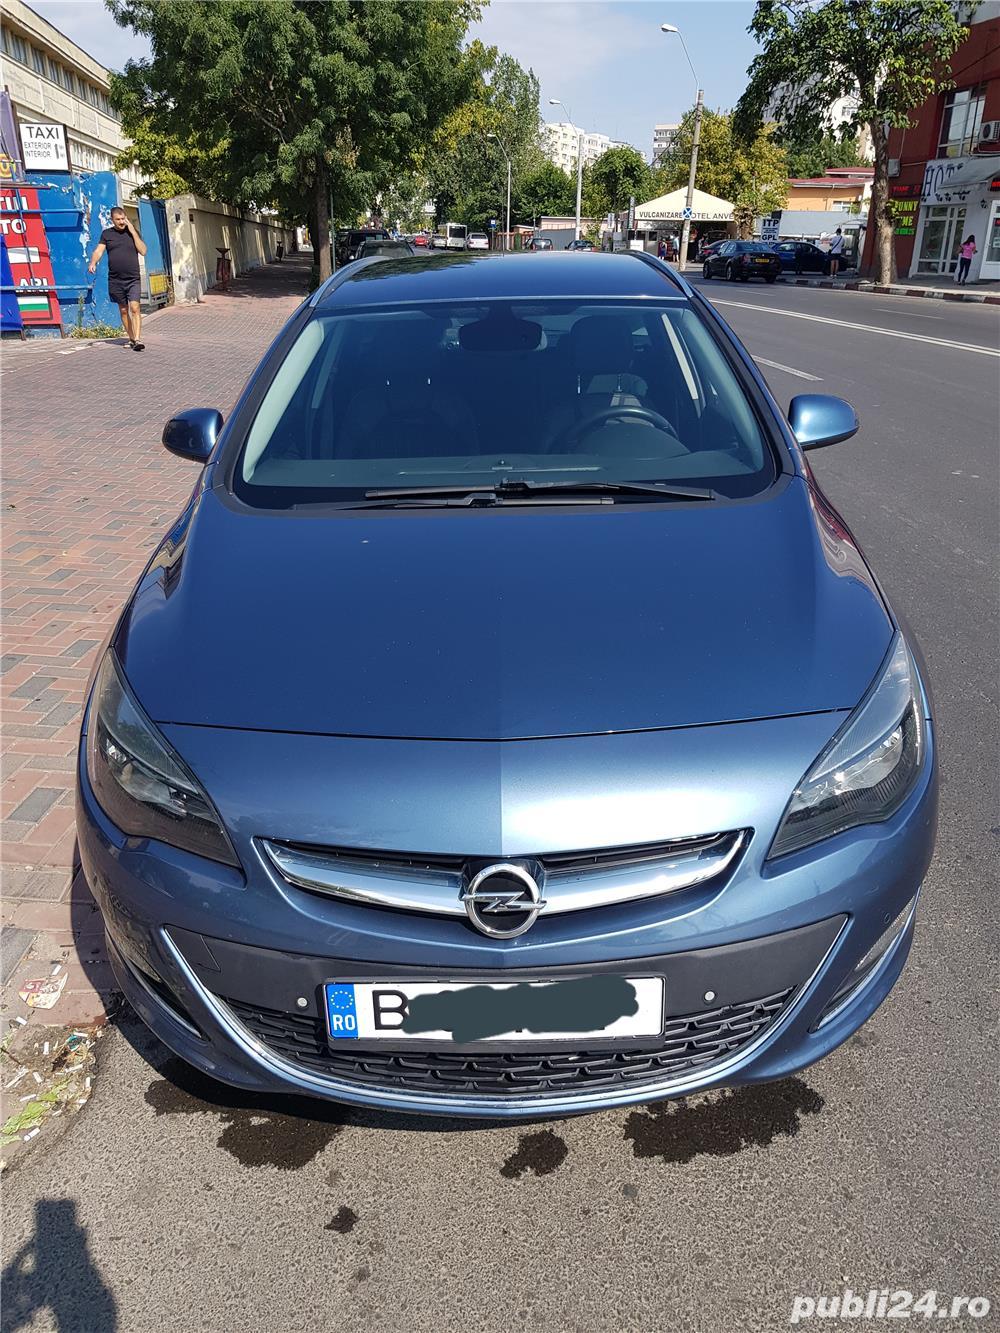 Opel Astra, ford,  vw,  passat, golf, mazda ,fiat